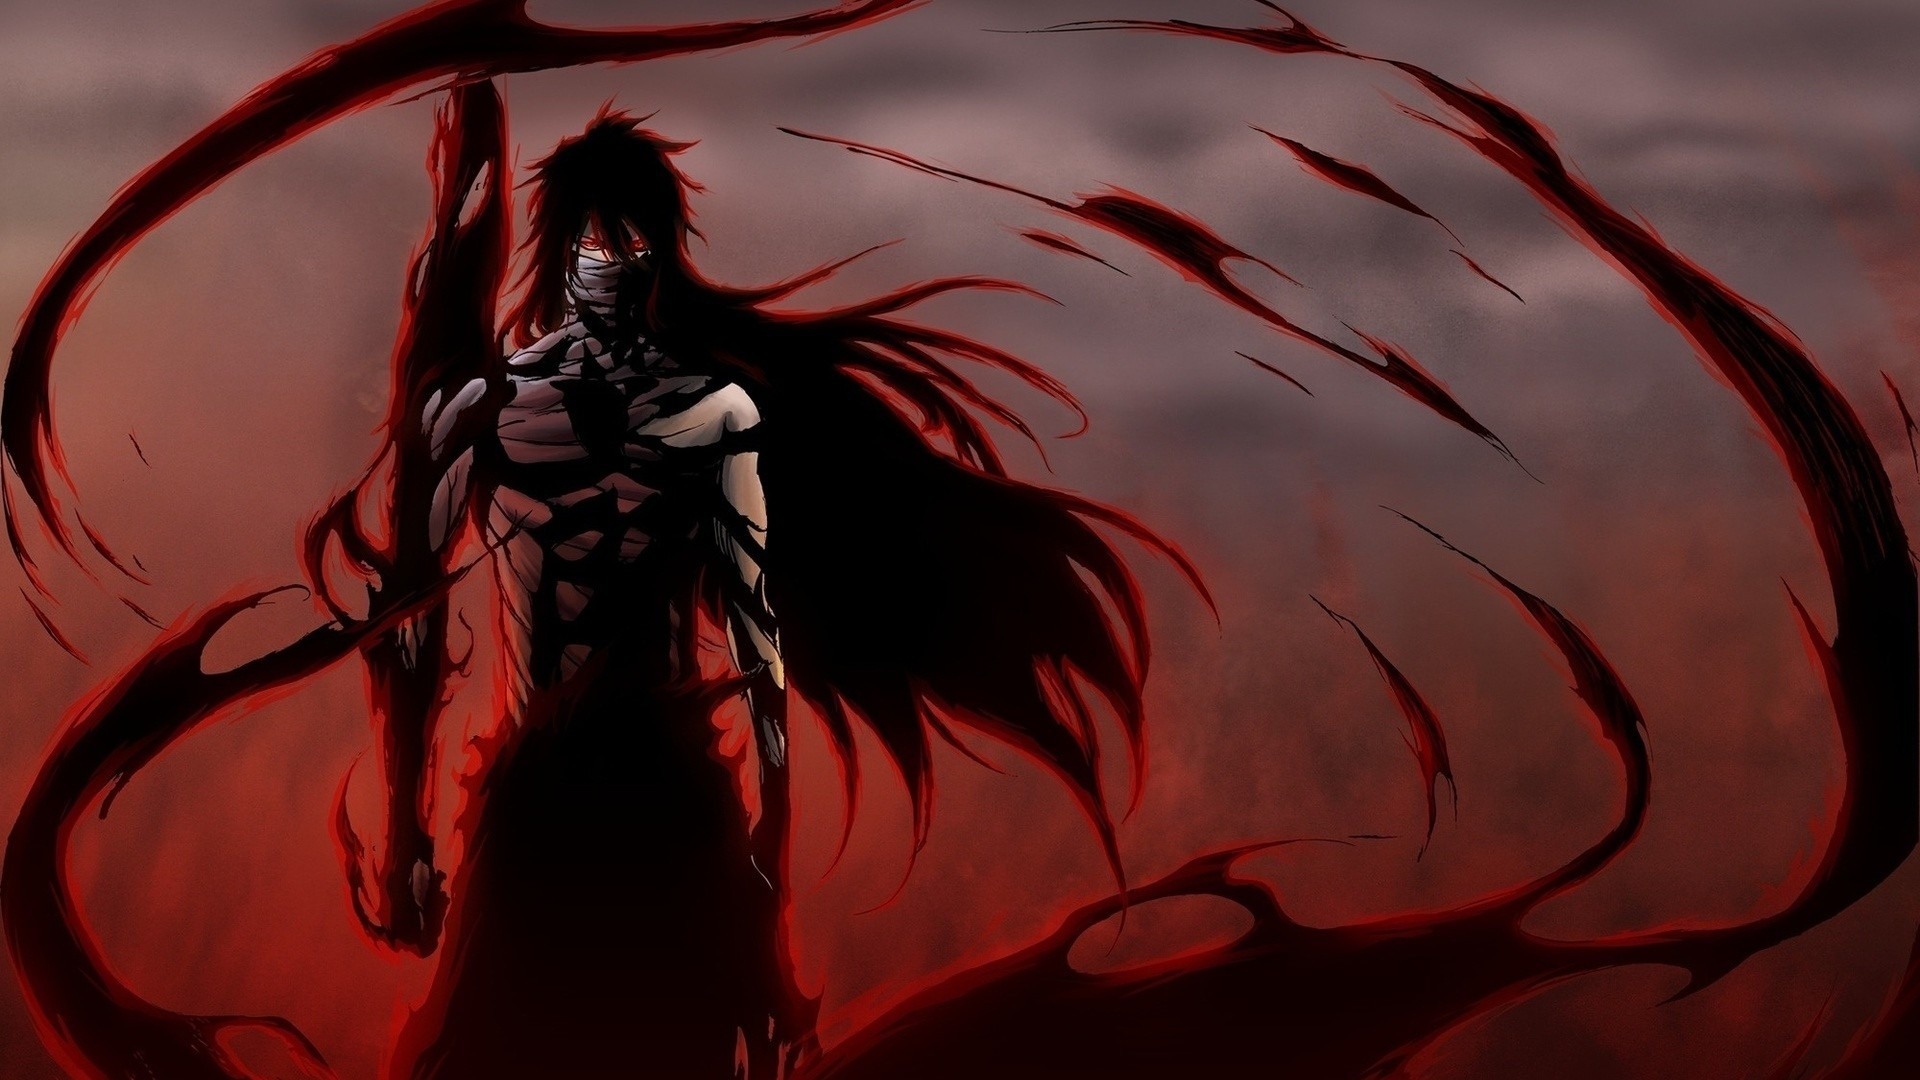 Hd Windows 10 Anime Wallpaper 82 Images